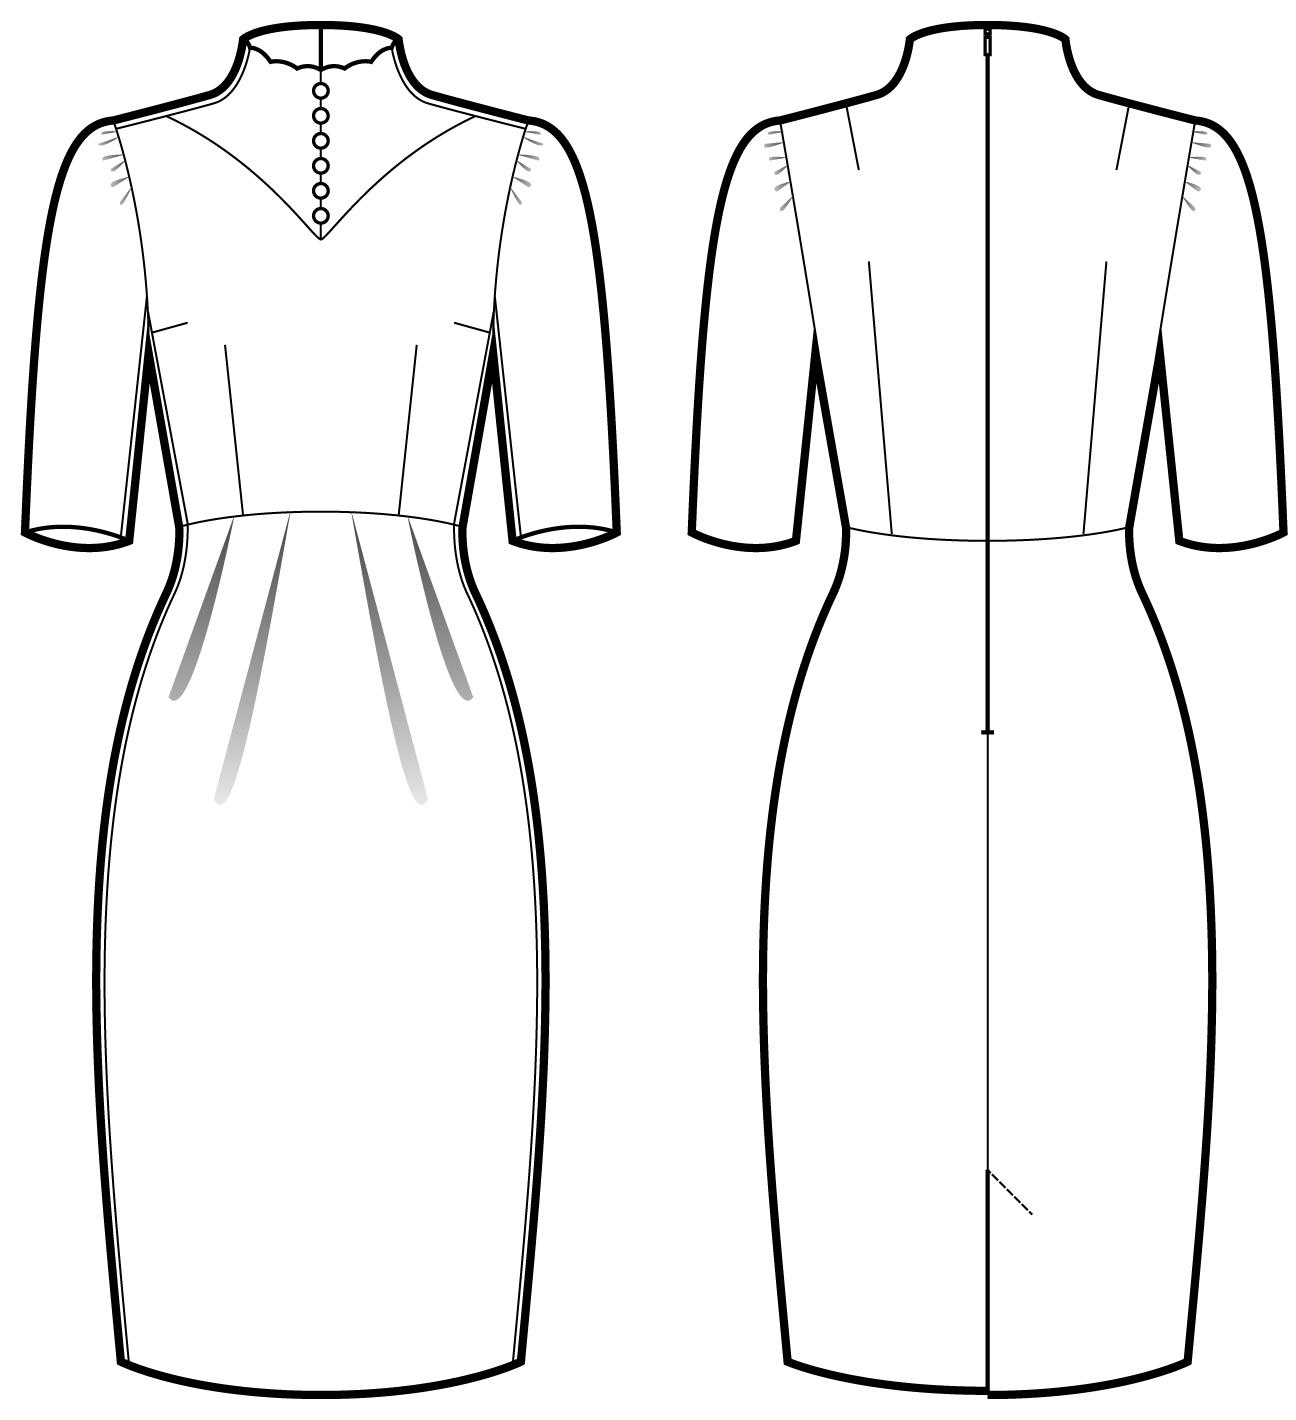 suzysewing antoinette dress pattern release